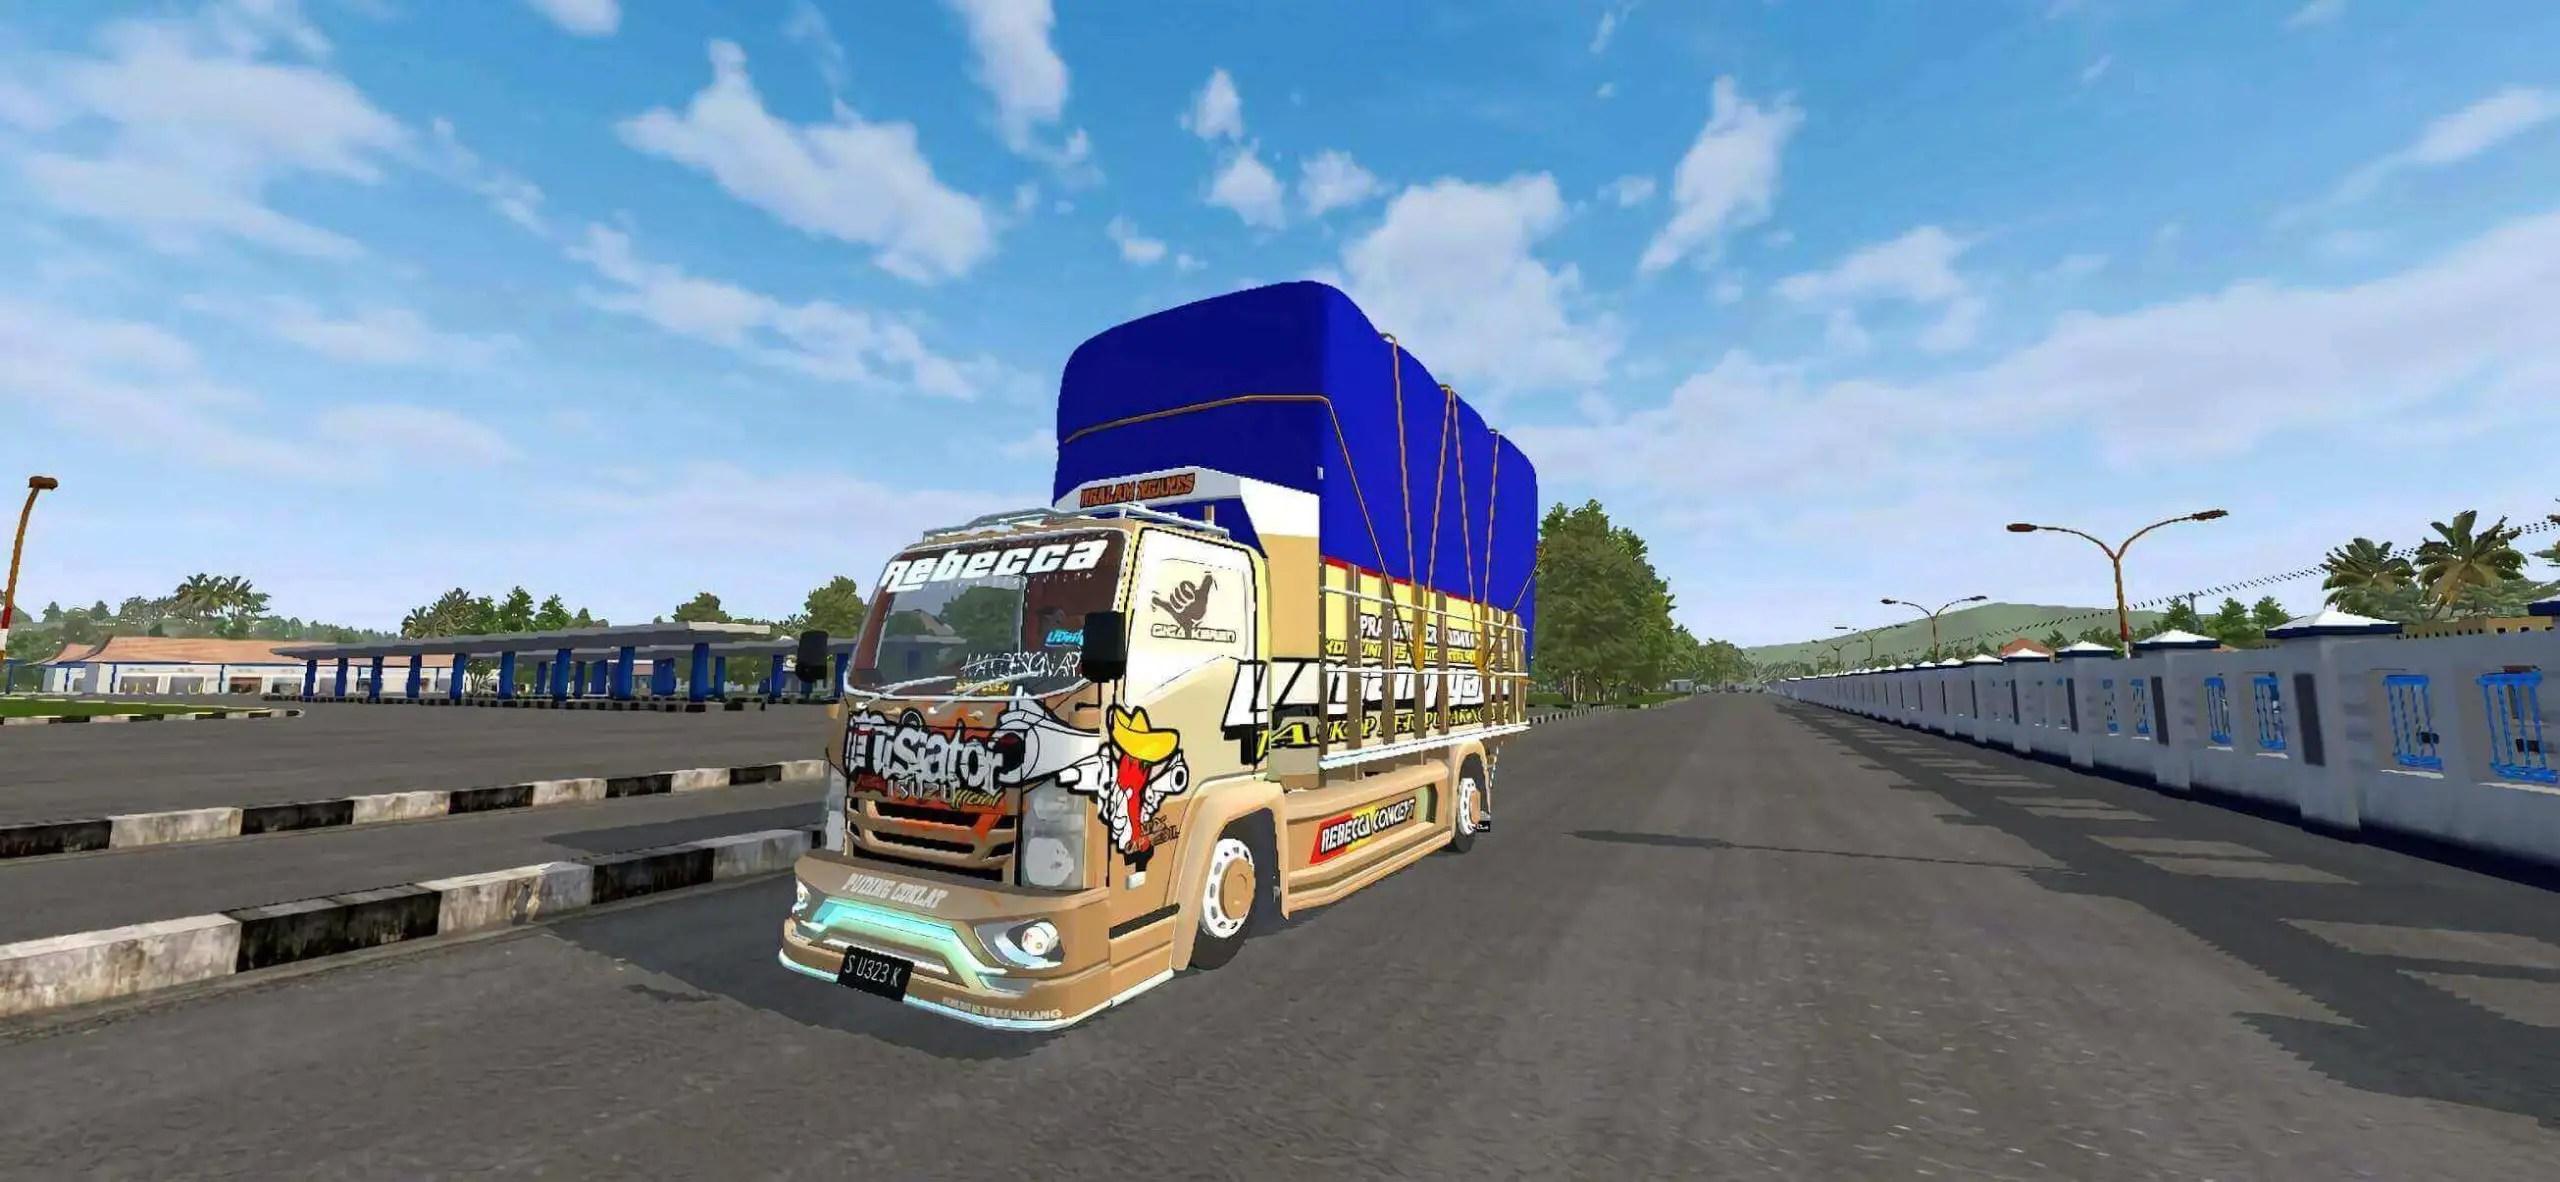 NMR 71 Inisiator Truck Mod BUSSID, Mod NMR 71 Inisiator BUSSID, BUSSID Truck Mod, Truck Mod BUSSID